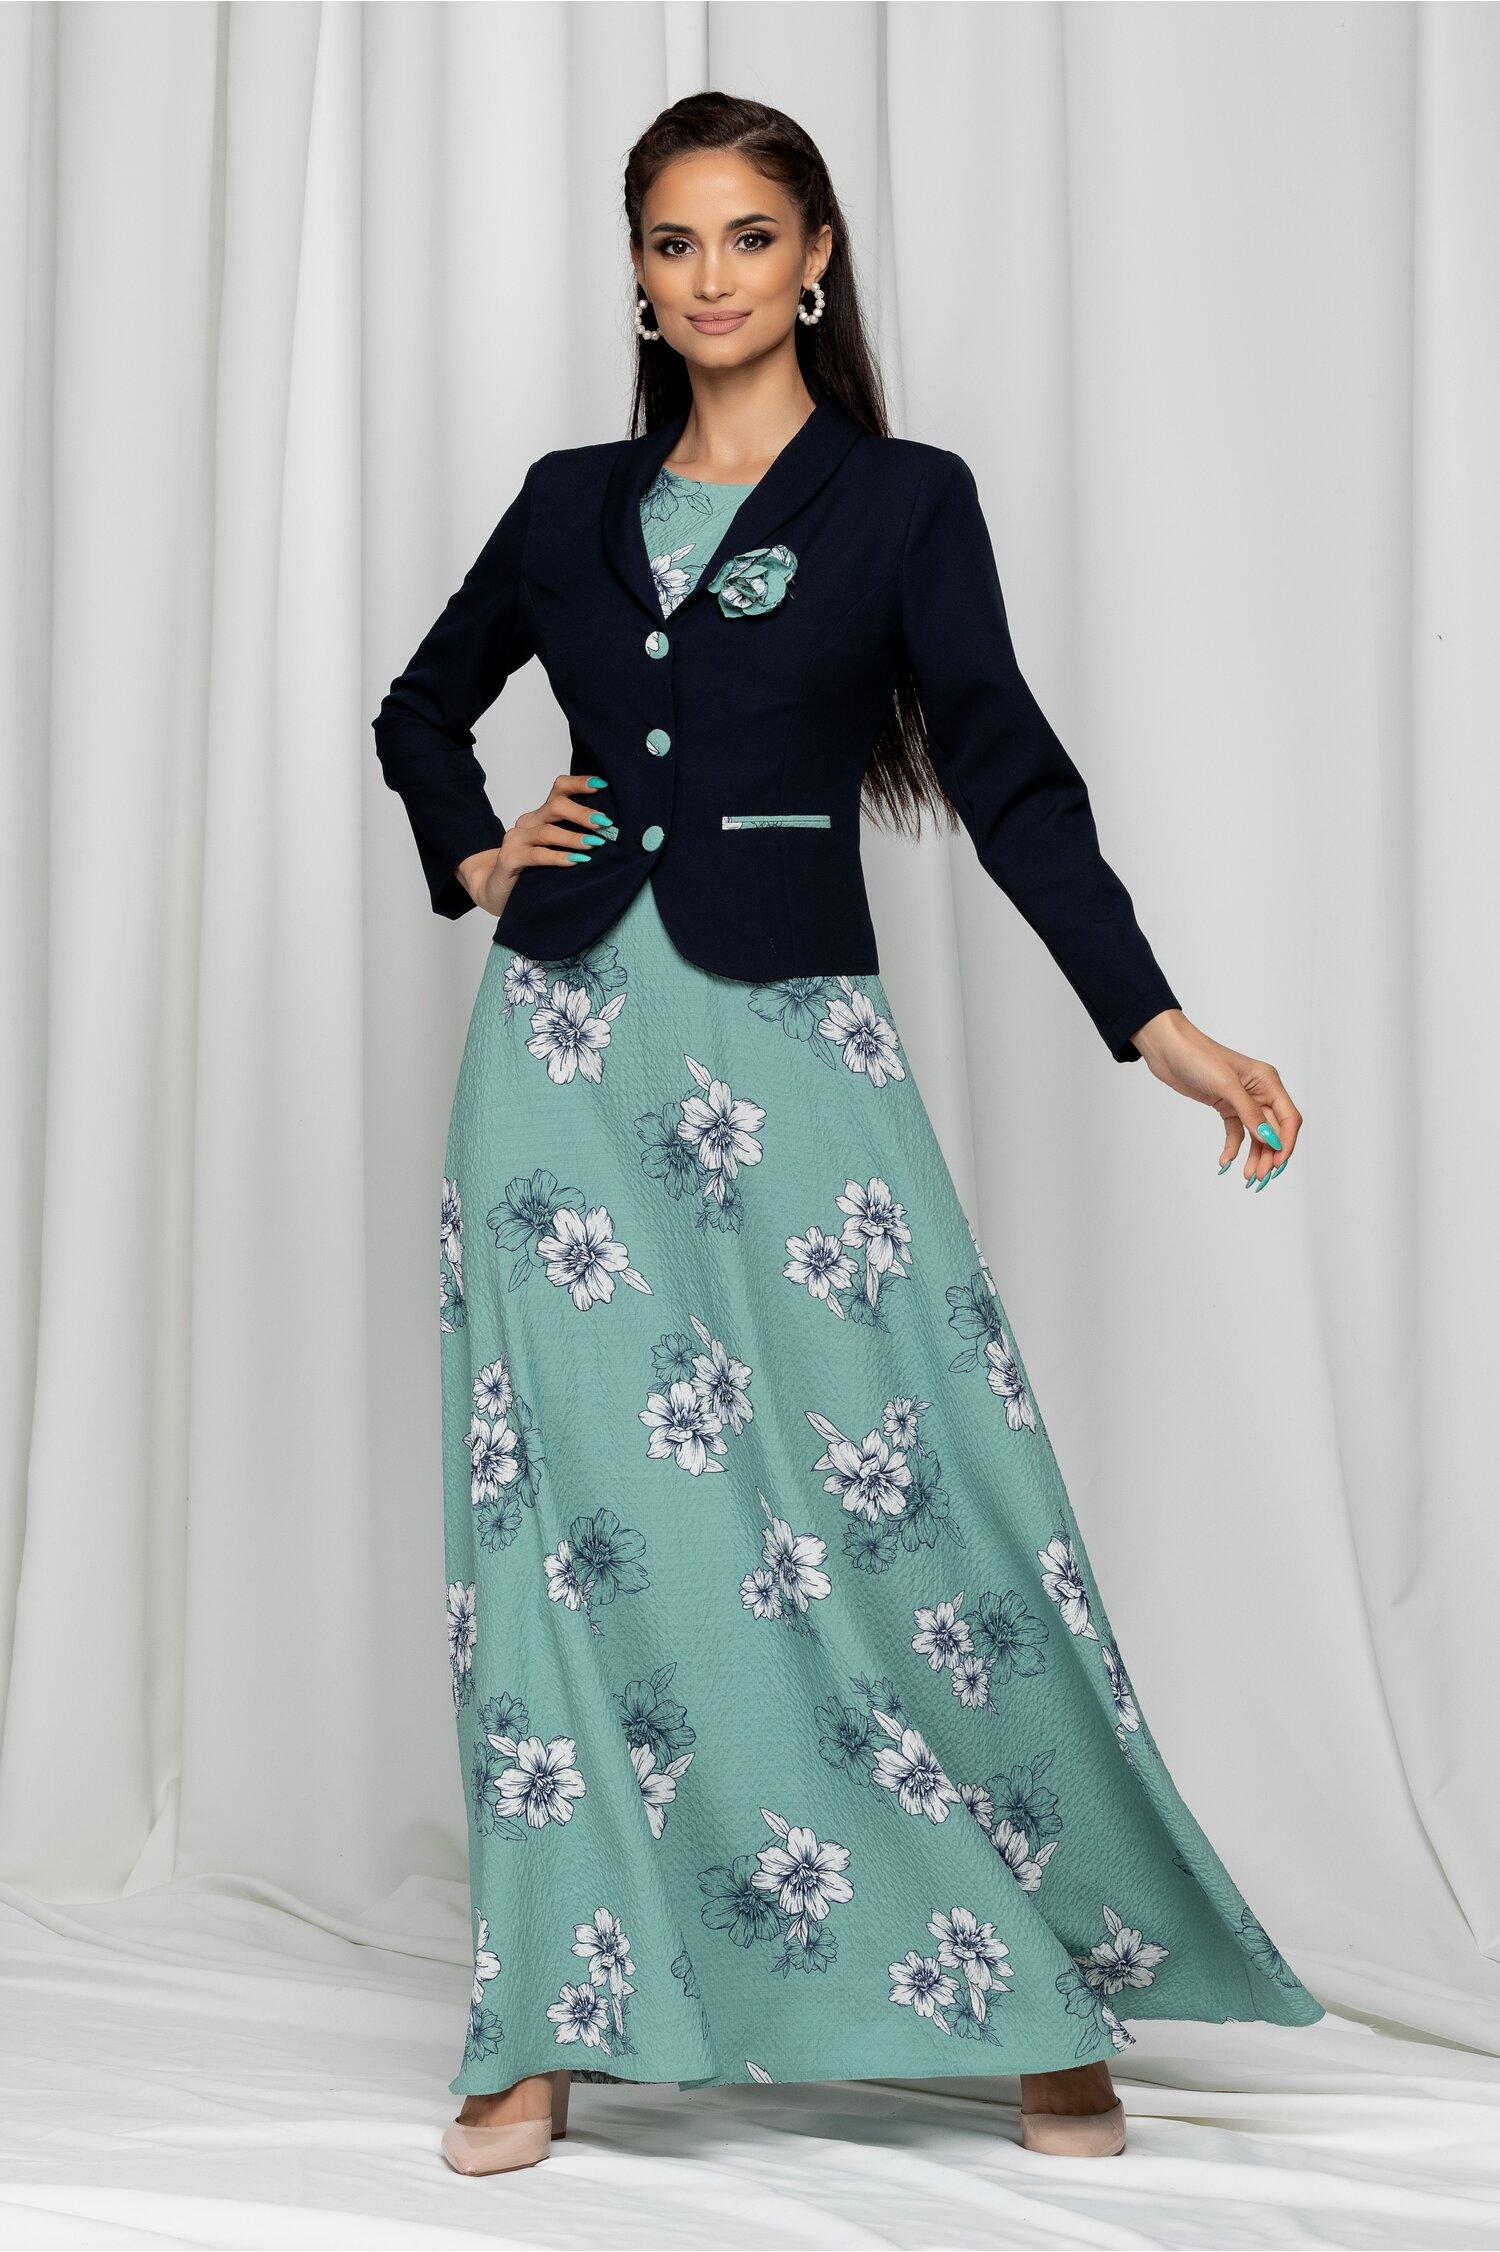 Compleu Iolanda verde cu rochie lunga si sacou